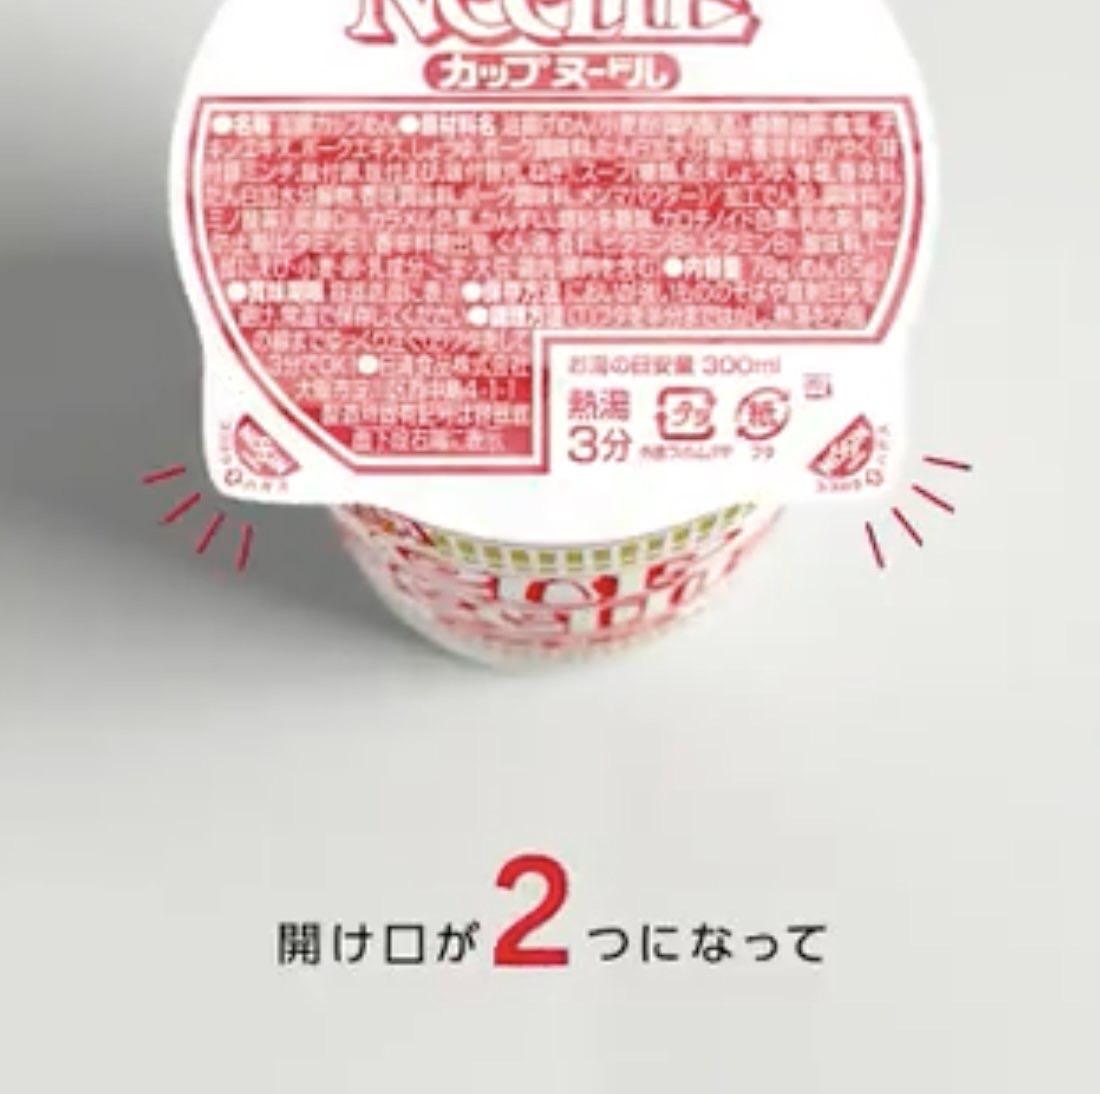 Cup noodle futa seal 04 04